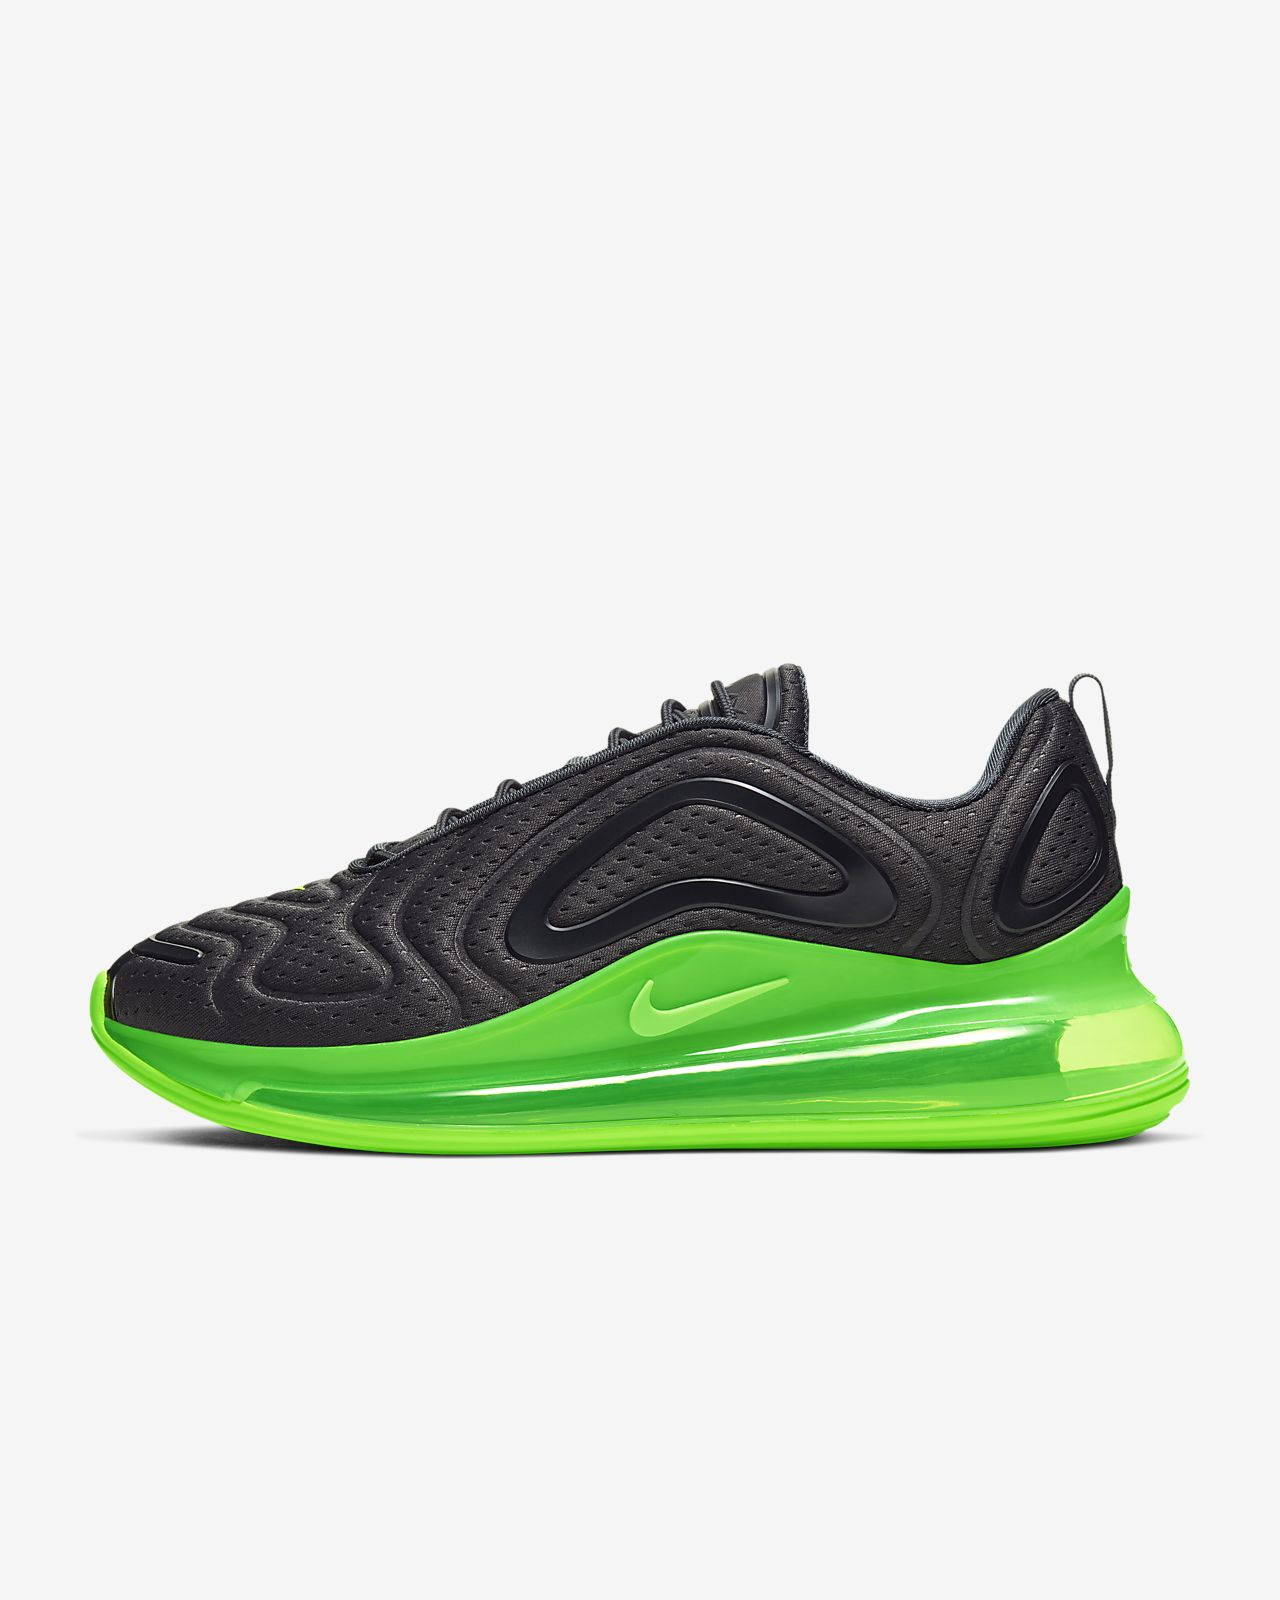 Nike Air Max 720 kolorowe męskie buty sportowe 40 45